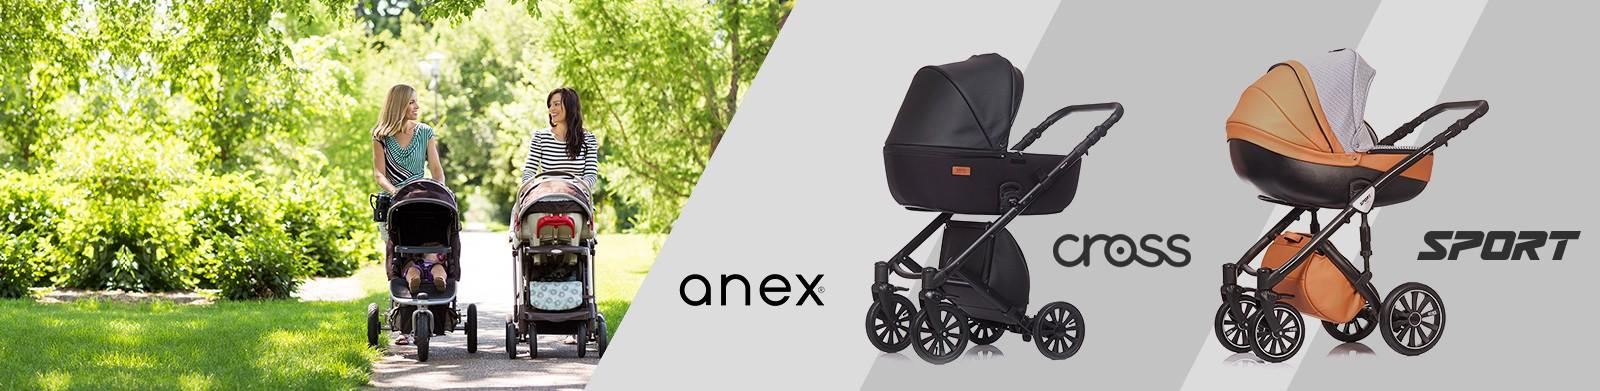 Anex - Sport i Cross